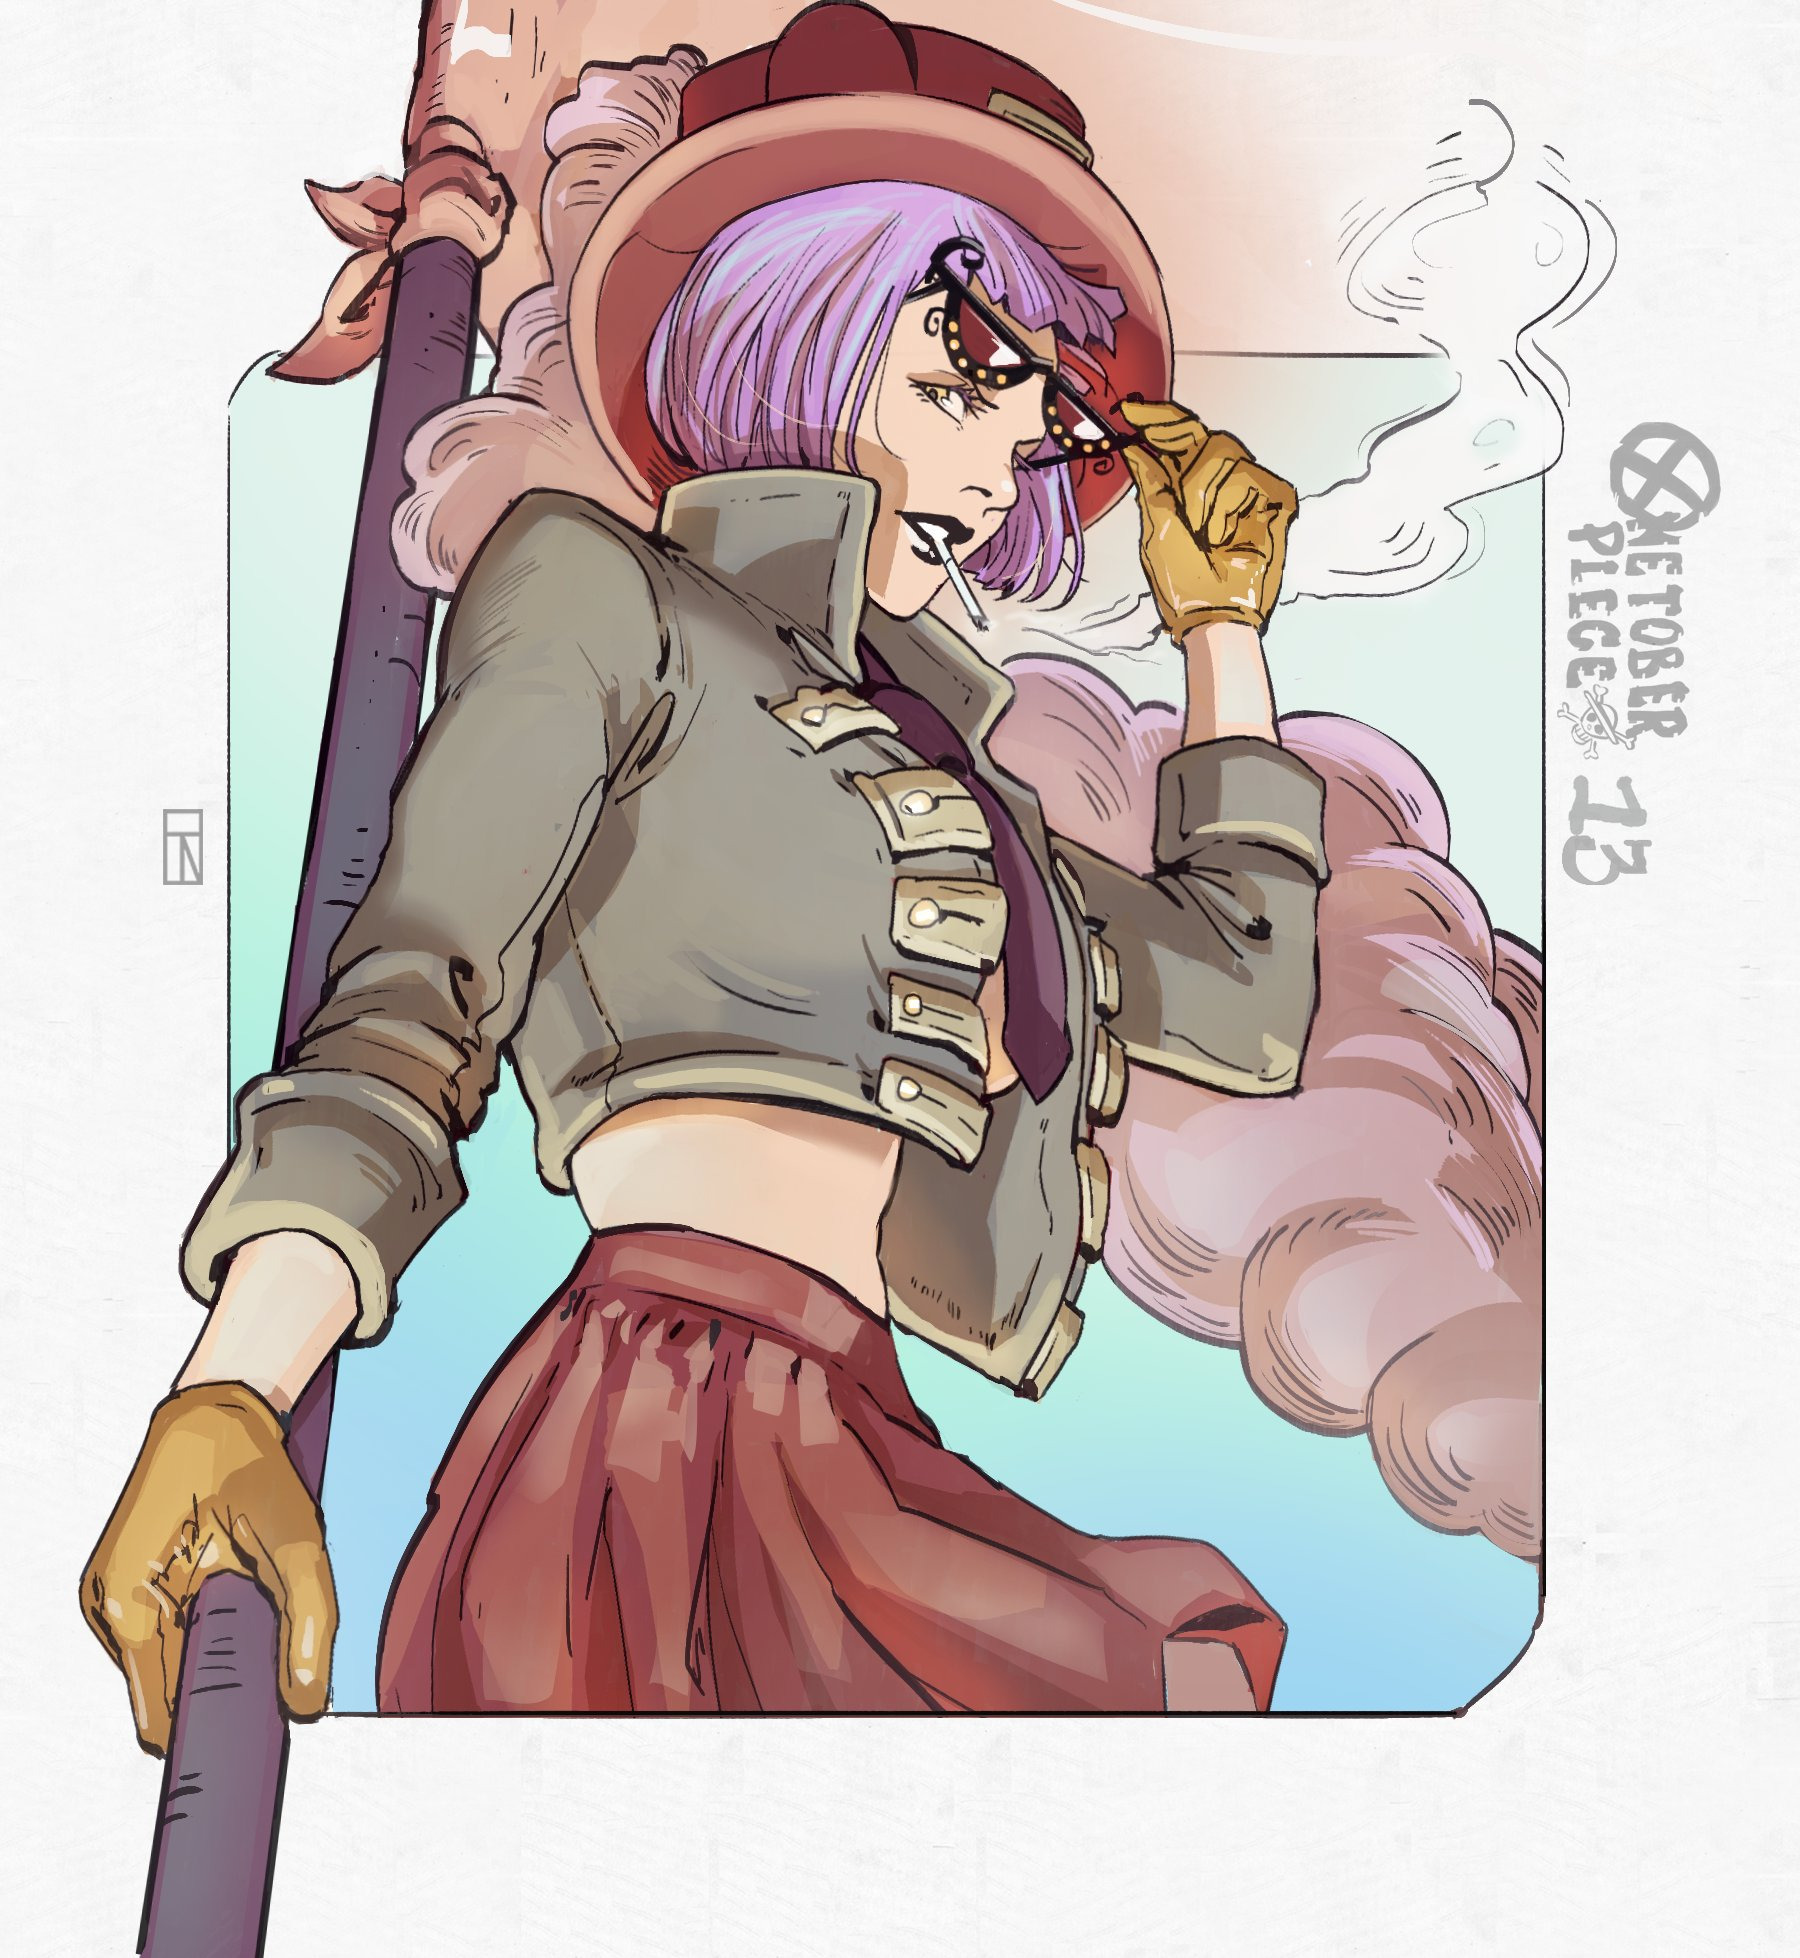 Belo Betty - ONE PIECE - Image #3115786 - Zerochan Anime ...